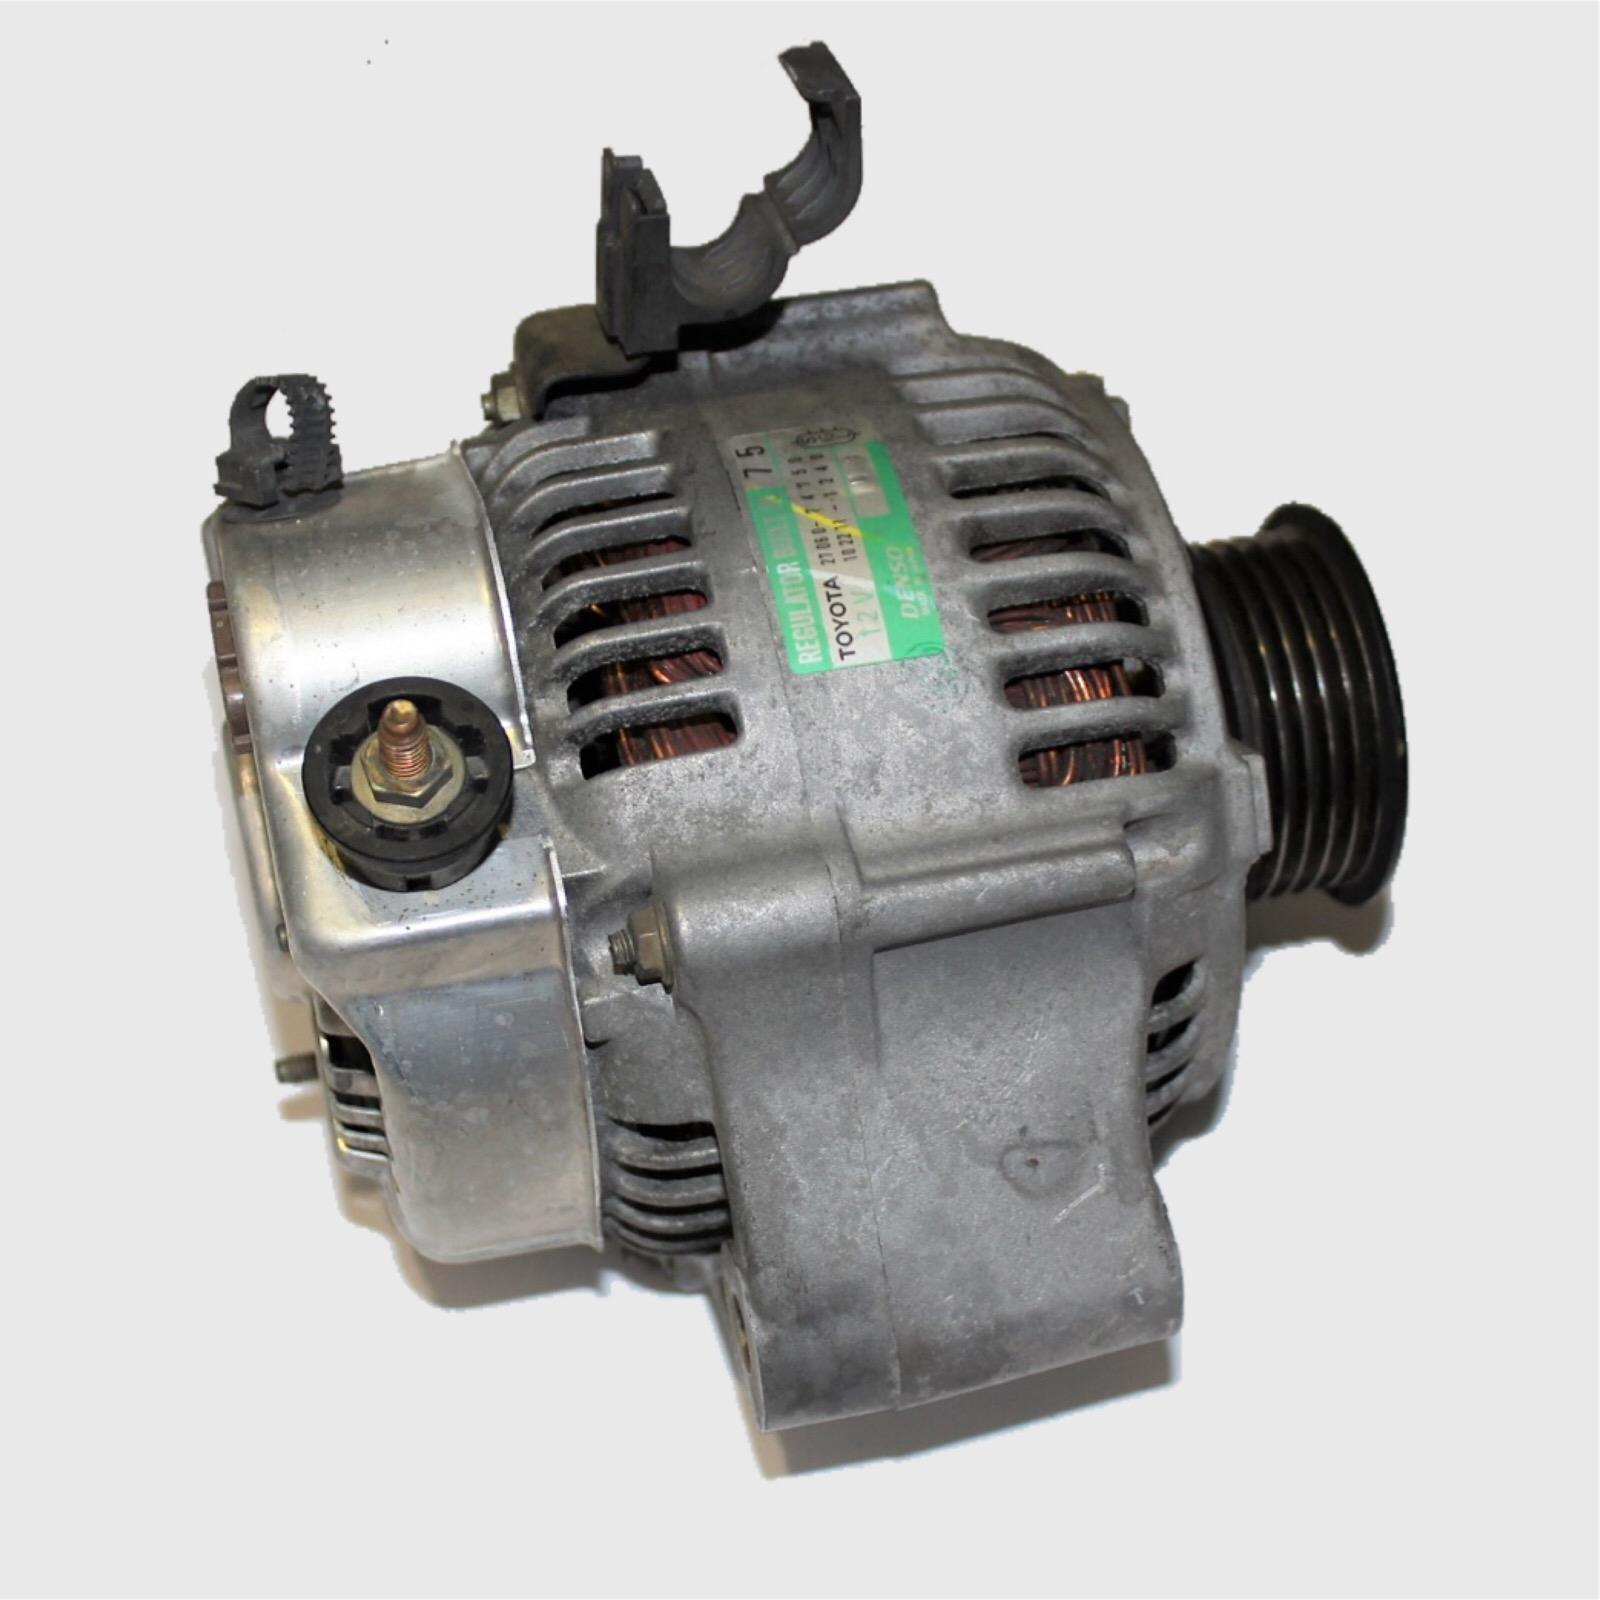 TOYOTA RAV4, Alternator, 2.0, 3SF, NIPPON DENSO, SXA1#R, 10/97-07/00